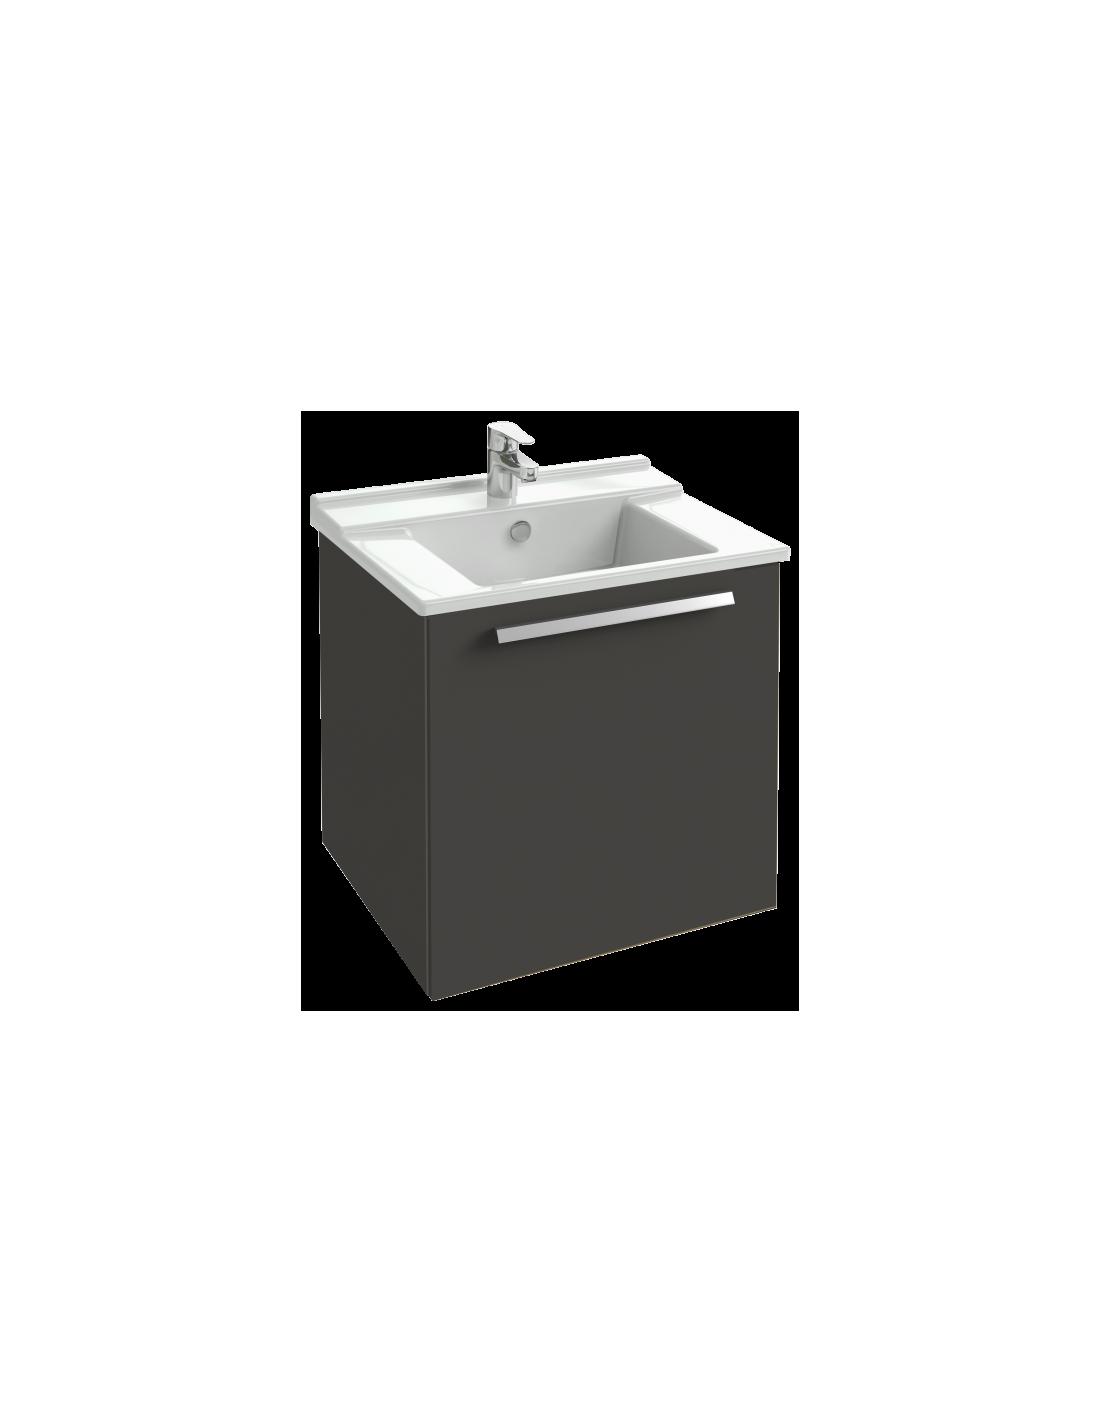 meuble 1 tiroir sous plan vasque struktura jacob delafon. Black Bedroom Furniture Sets. Home Design Ideas